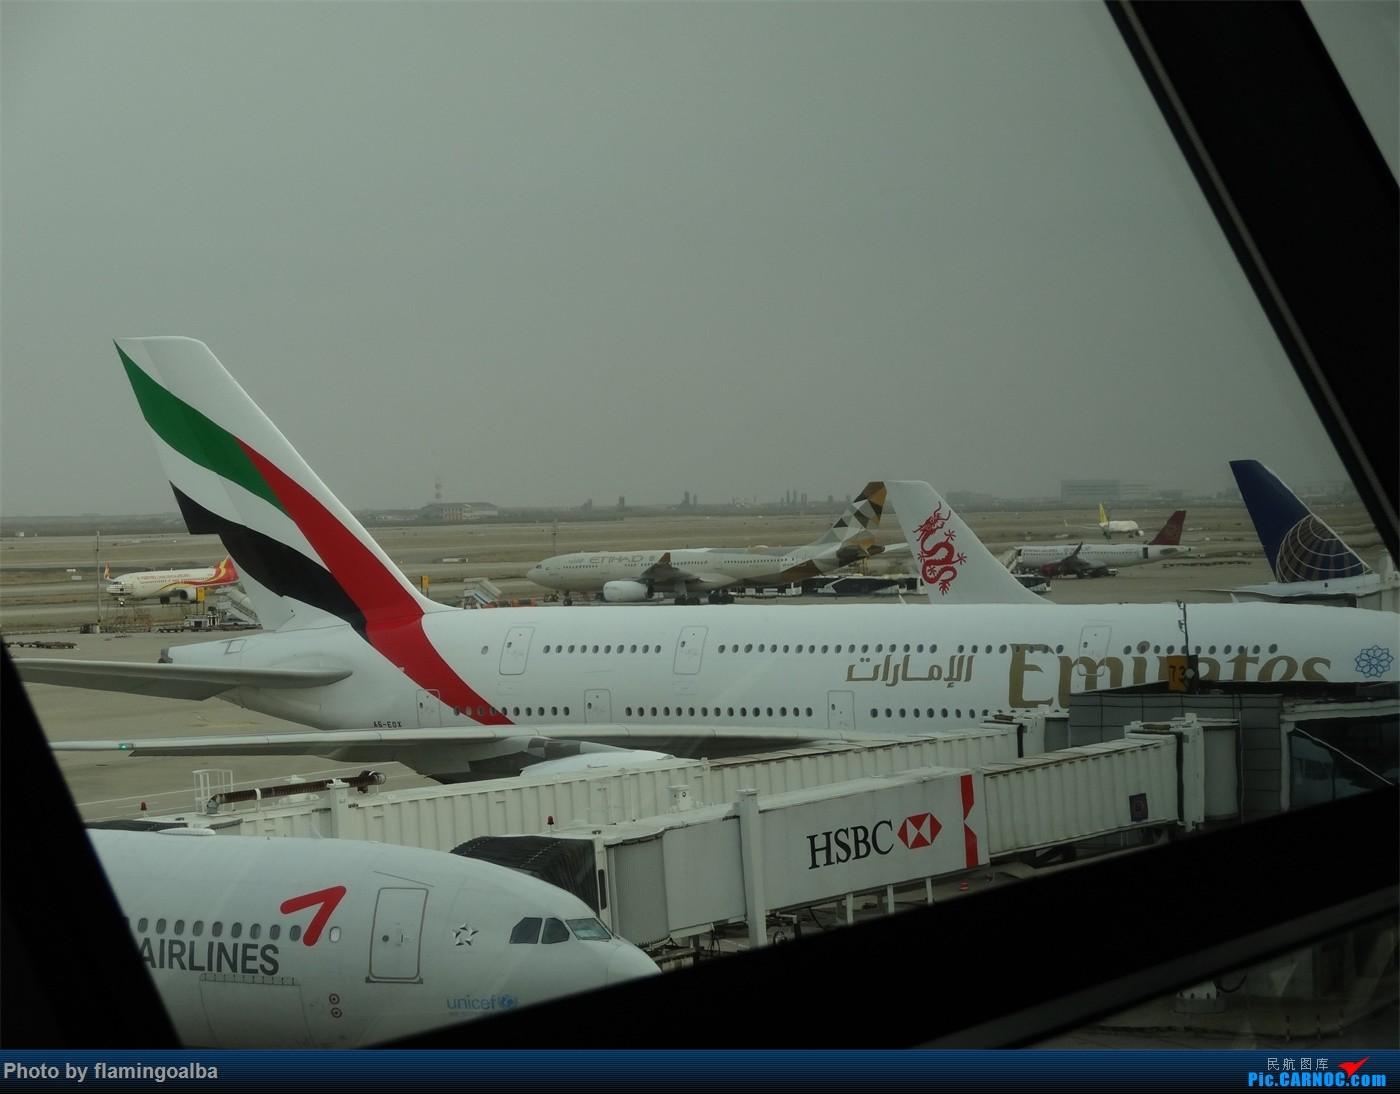 Re:[原创]浦东-达拉斯-纽瓦克-华盛顿里根-拉斯维加斯-洛杉矶-达拉斯-浦东 A380-800 A6-EOX 中国上海浦东国际机场